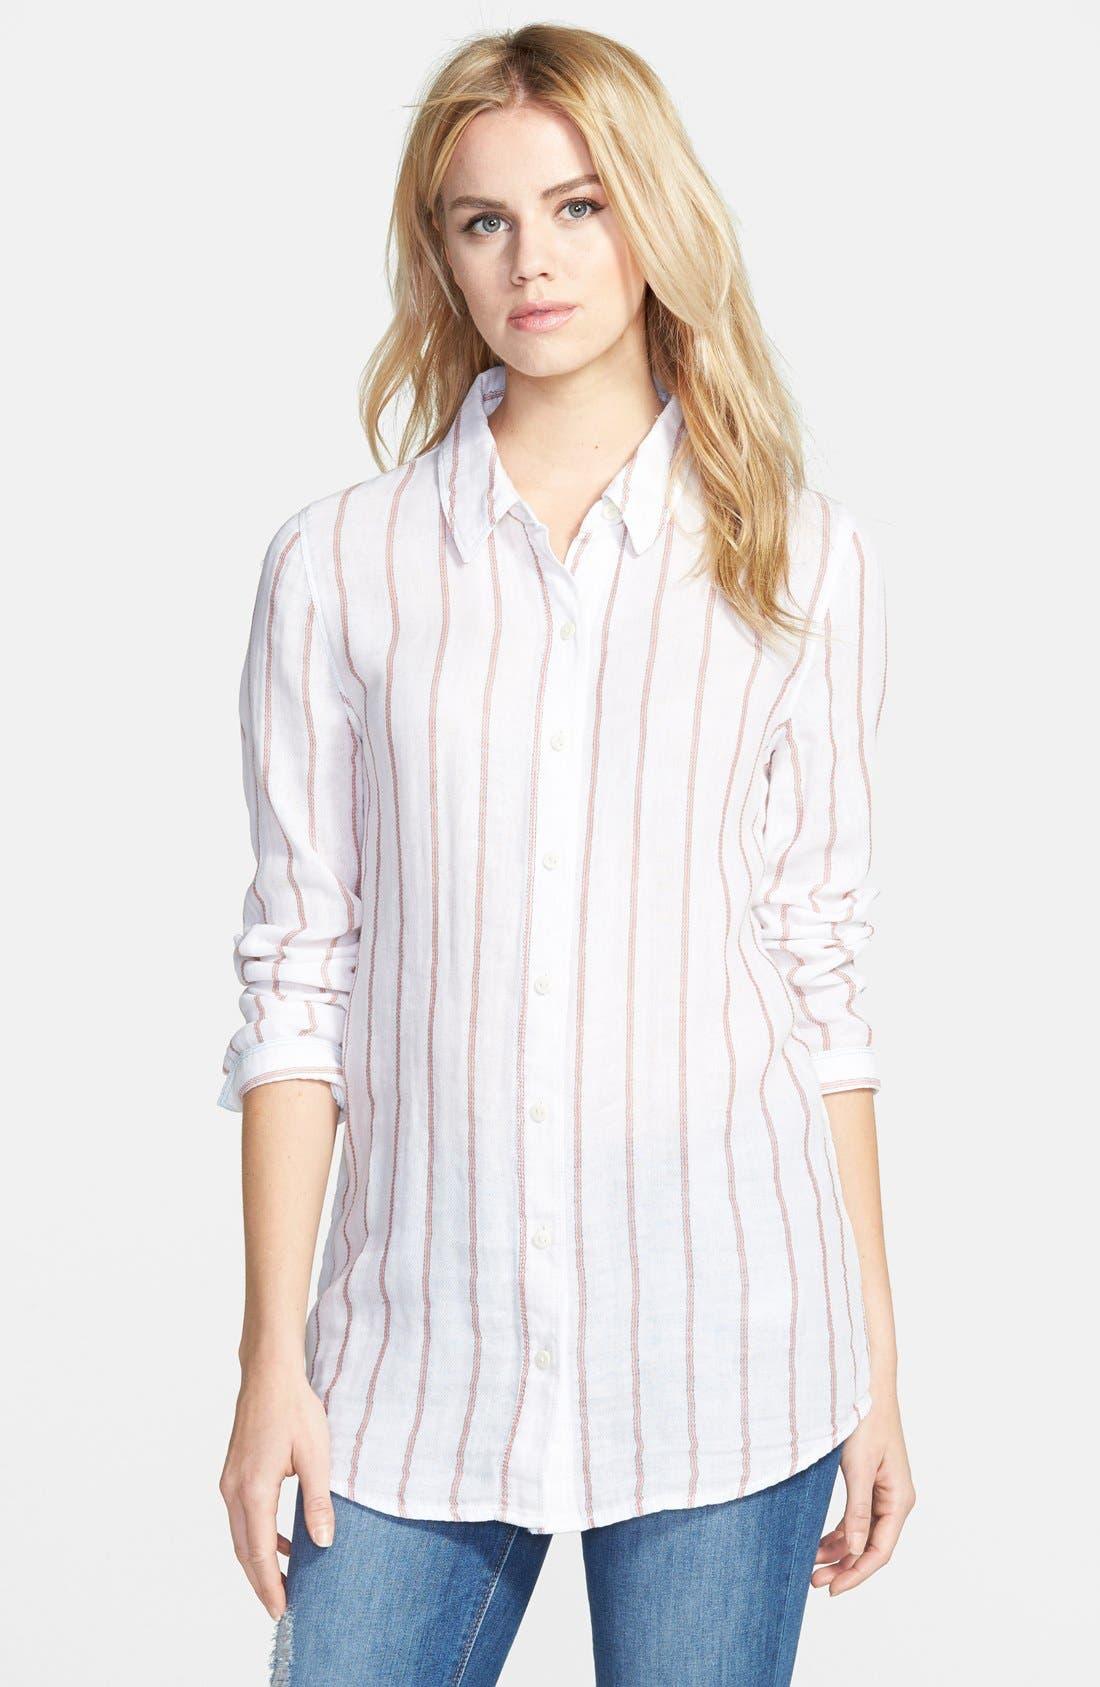 Treasure&Bond Long & Lean Boyfriend Shirt,                         Main,                         color, Coral Spice Ticking Stripe